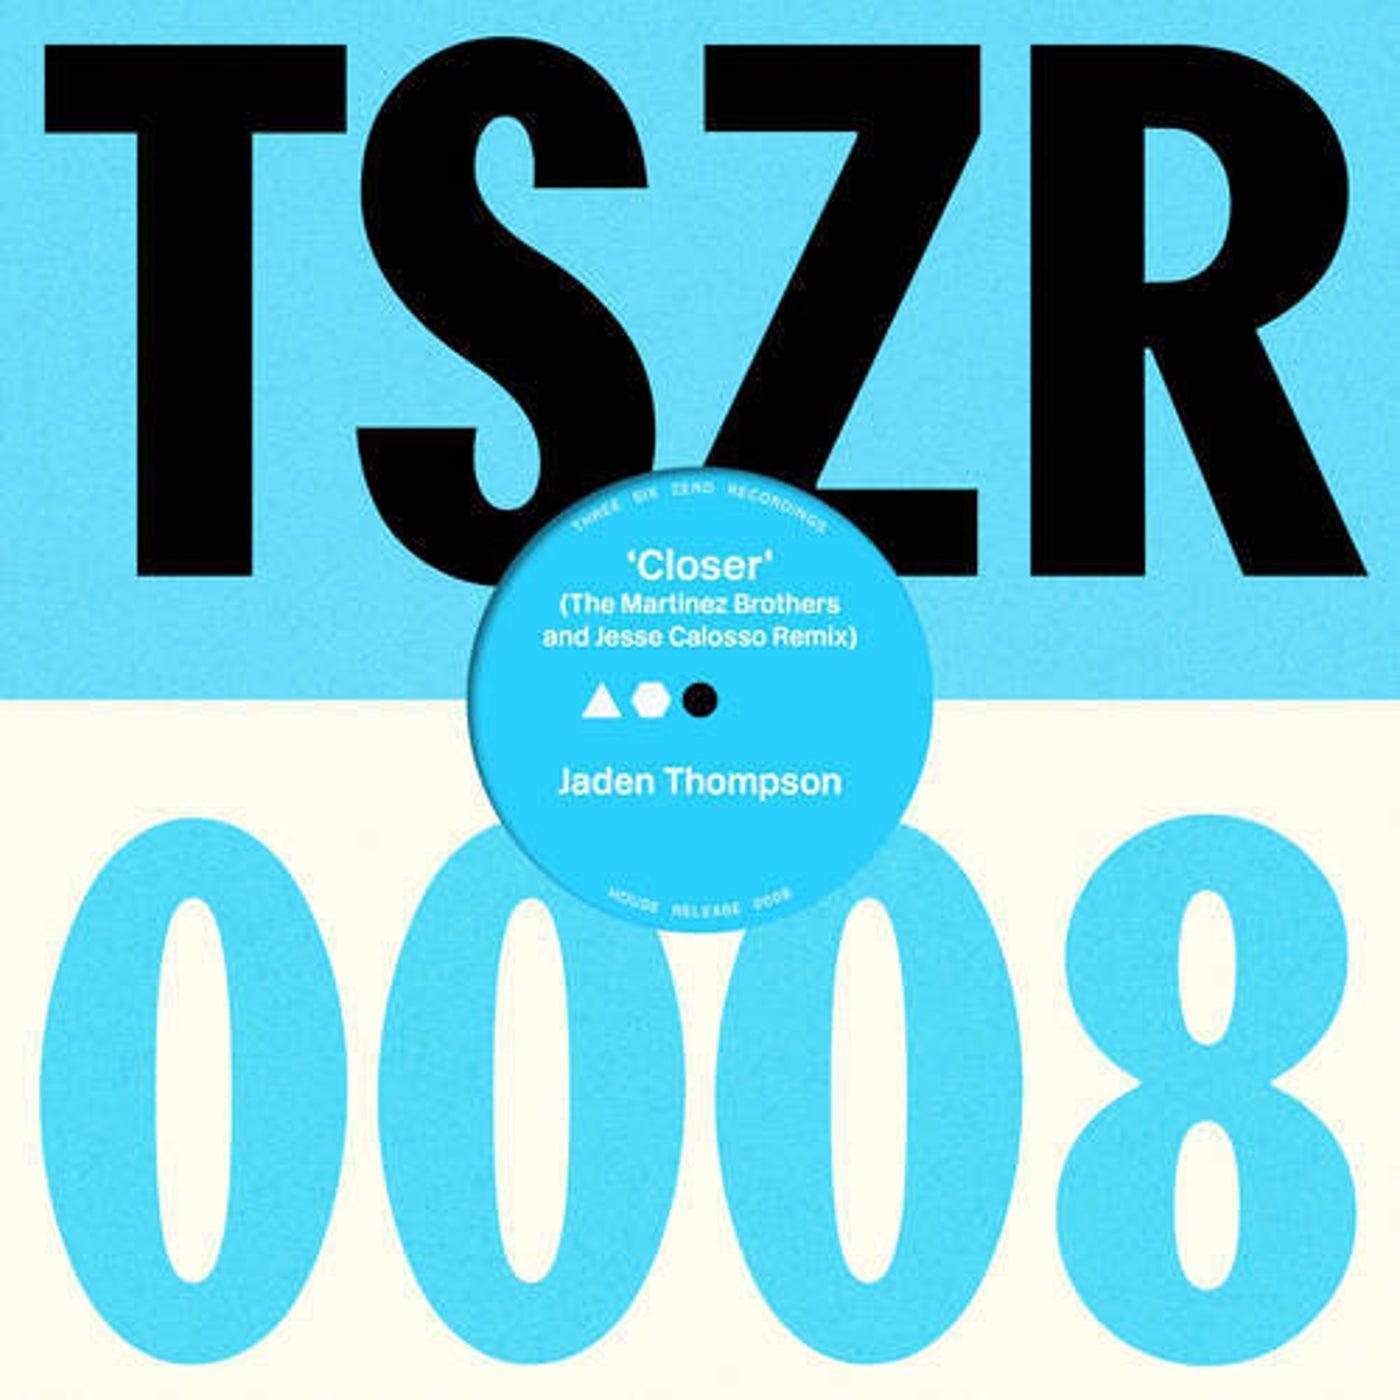 Closer (The Martinez Brothers & Jesse Calosso Extended Remix) (Original Mix)